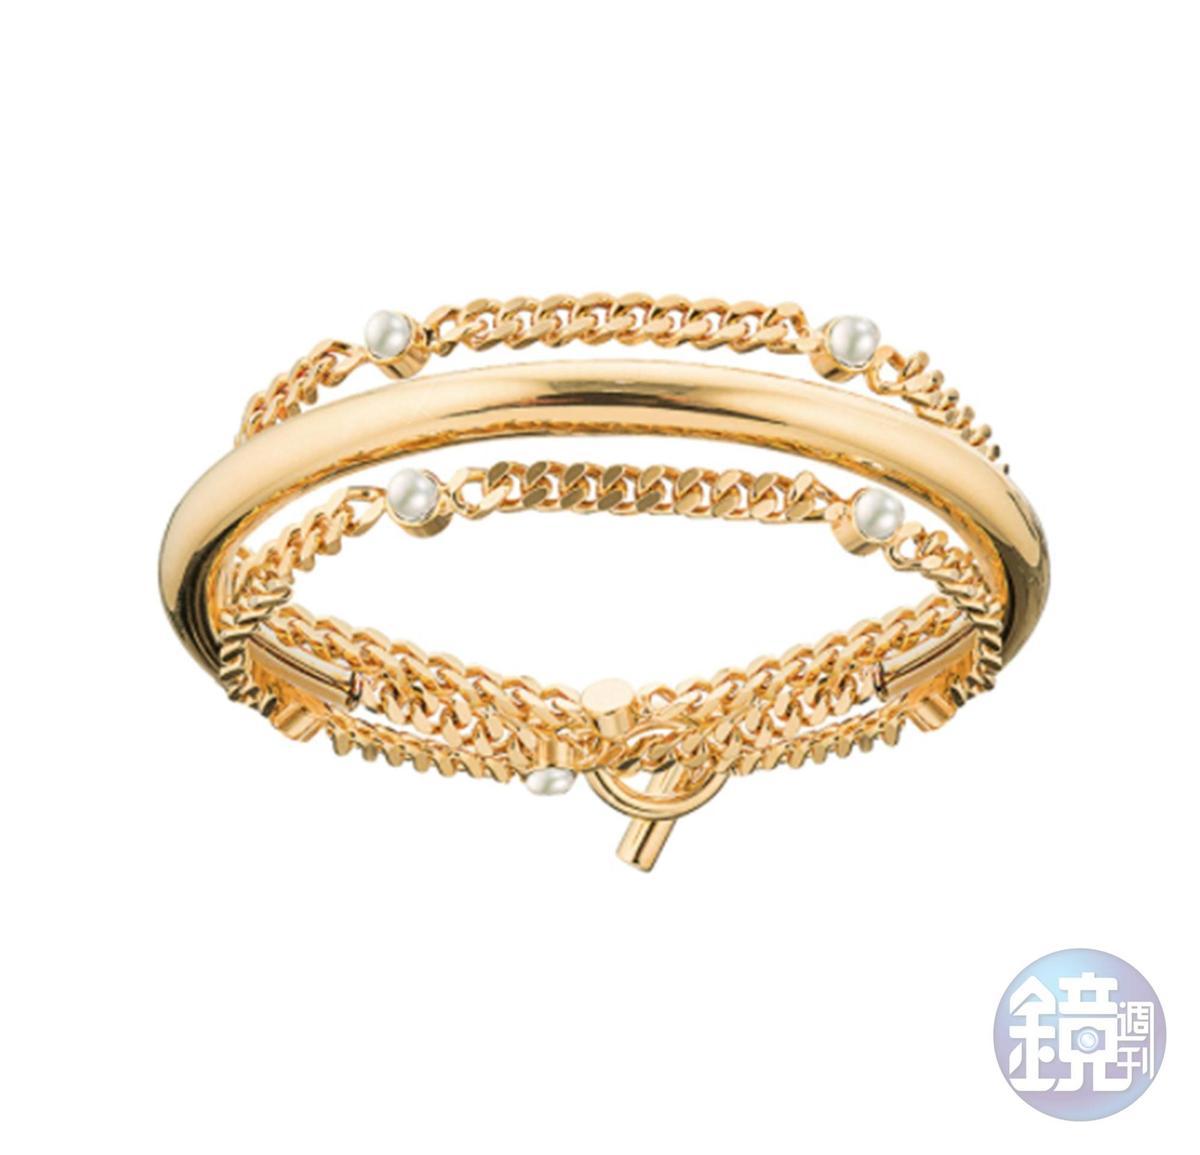 VITA FEDE X TAST獨家聯名款:Nora半弧形麻花珍珠手鍊NT$15,400。